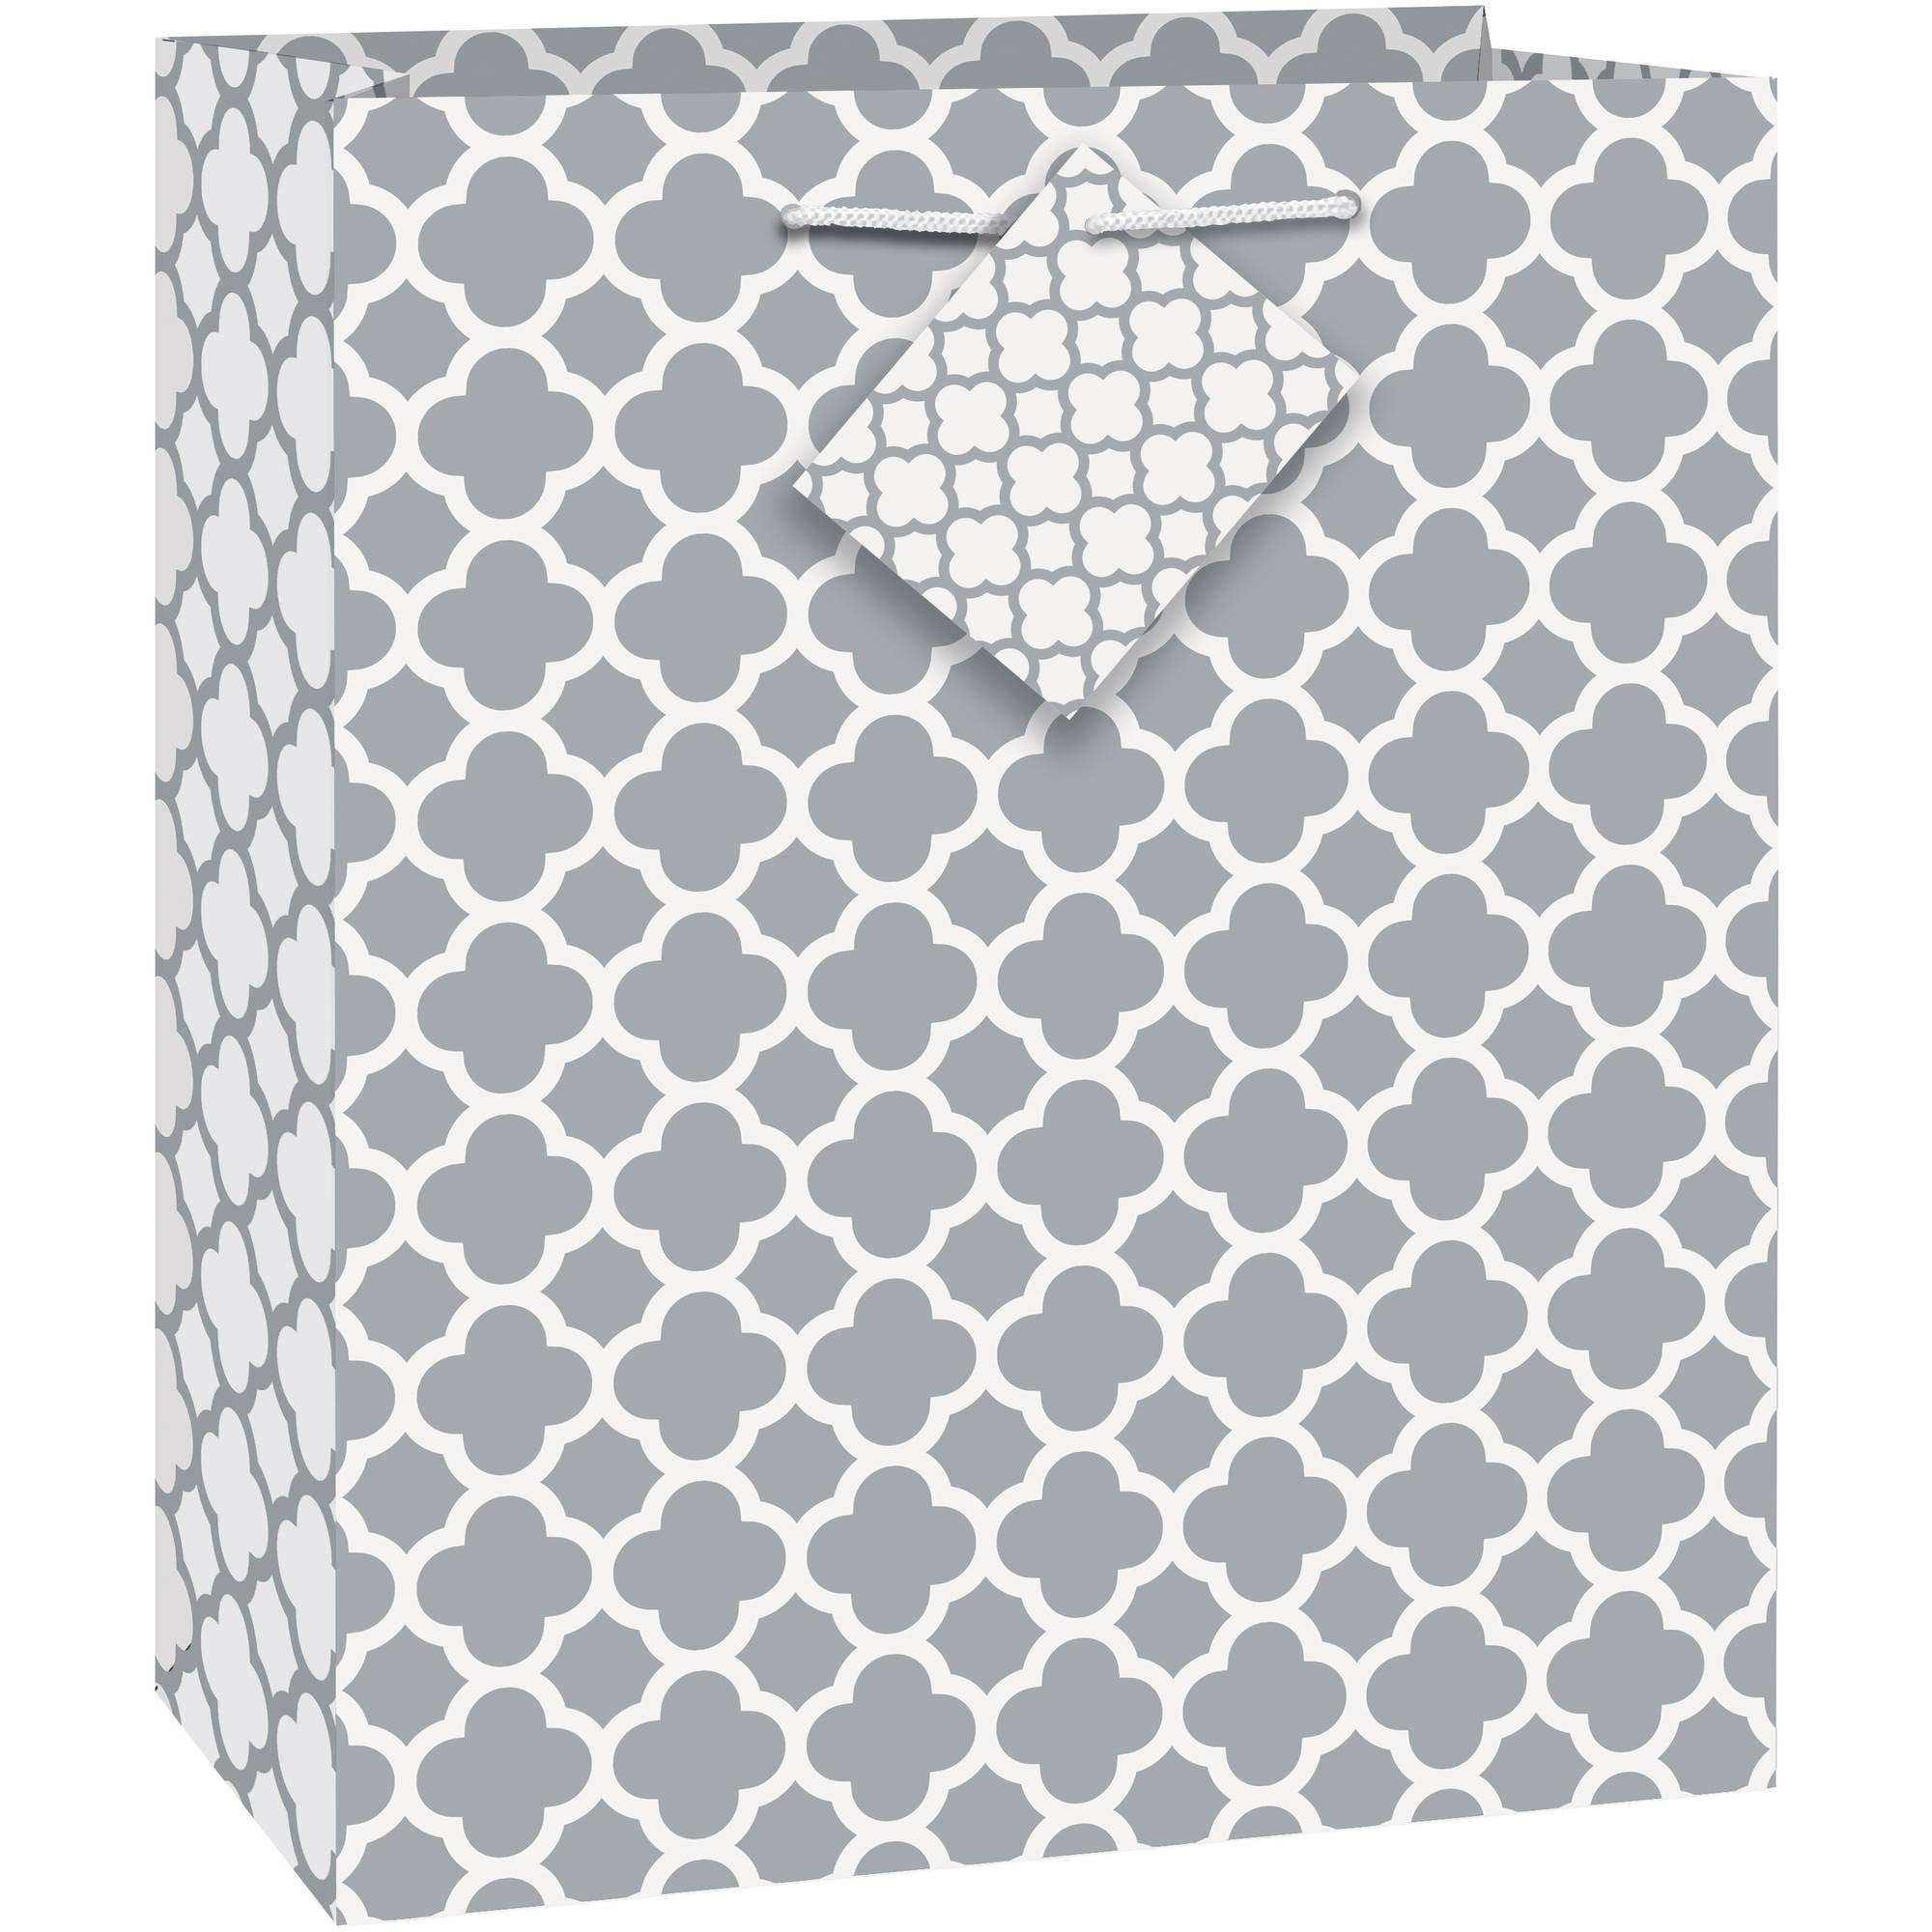 Silver Quatrefoil Gift Bag